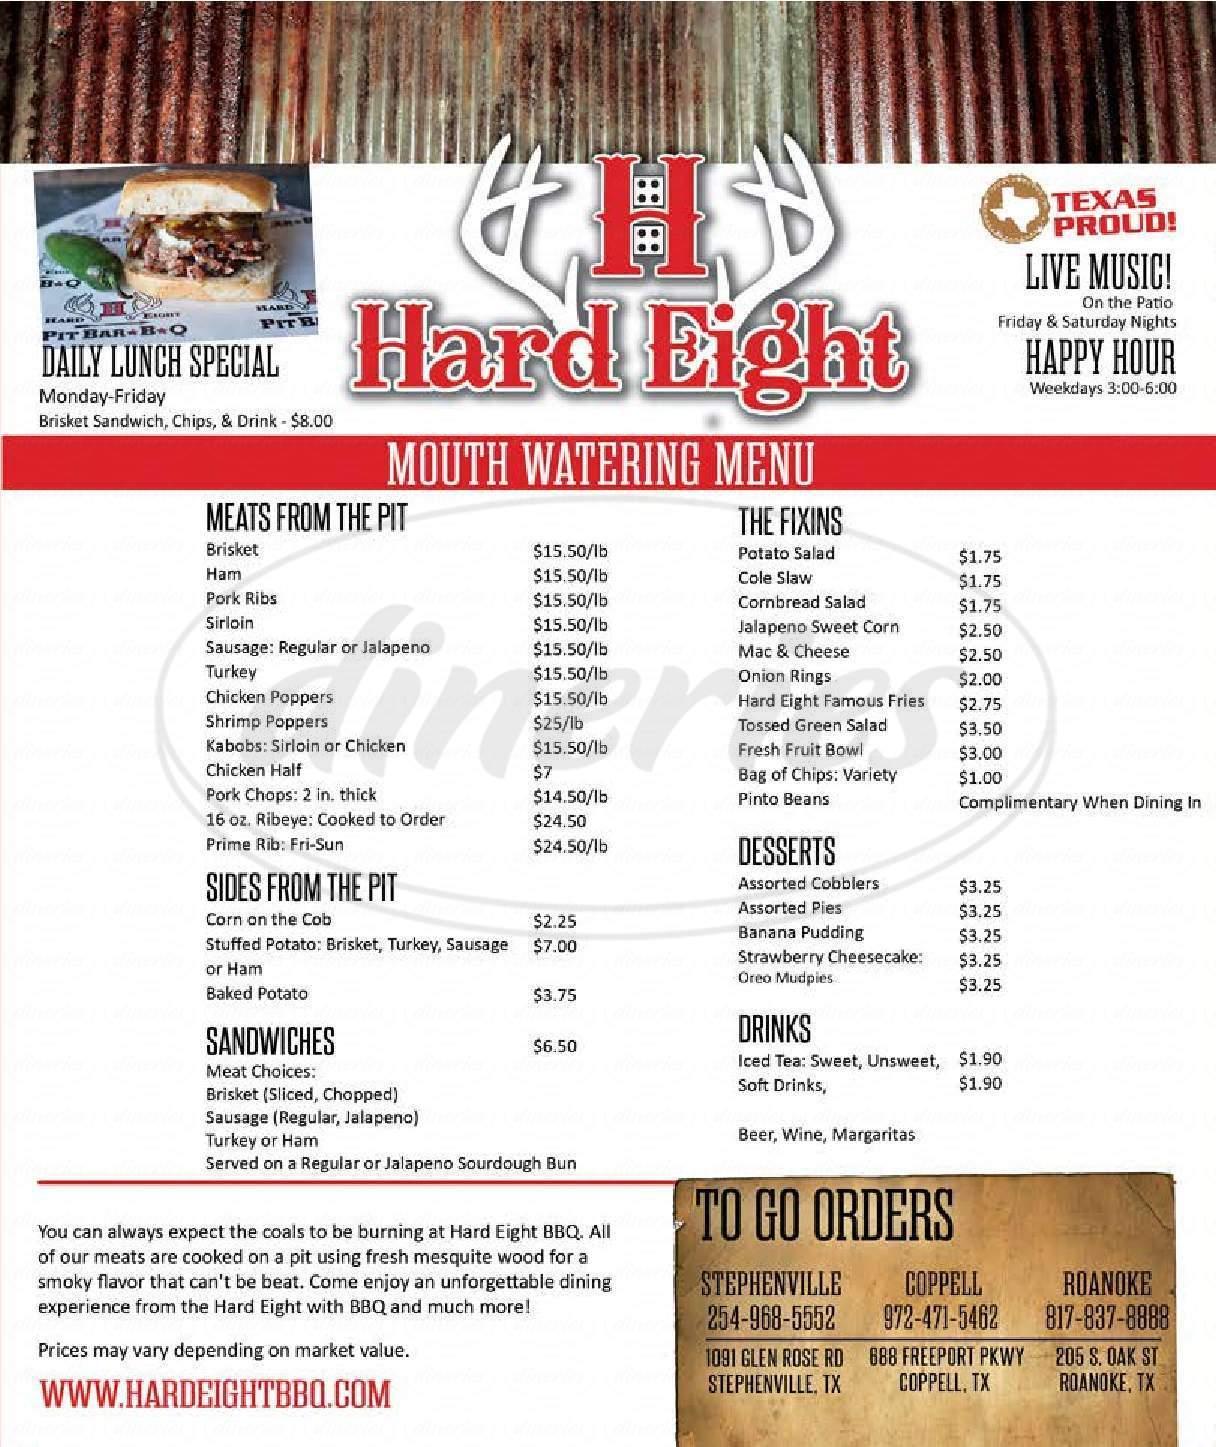 menu for Hard Eight BBQ